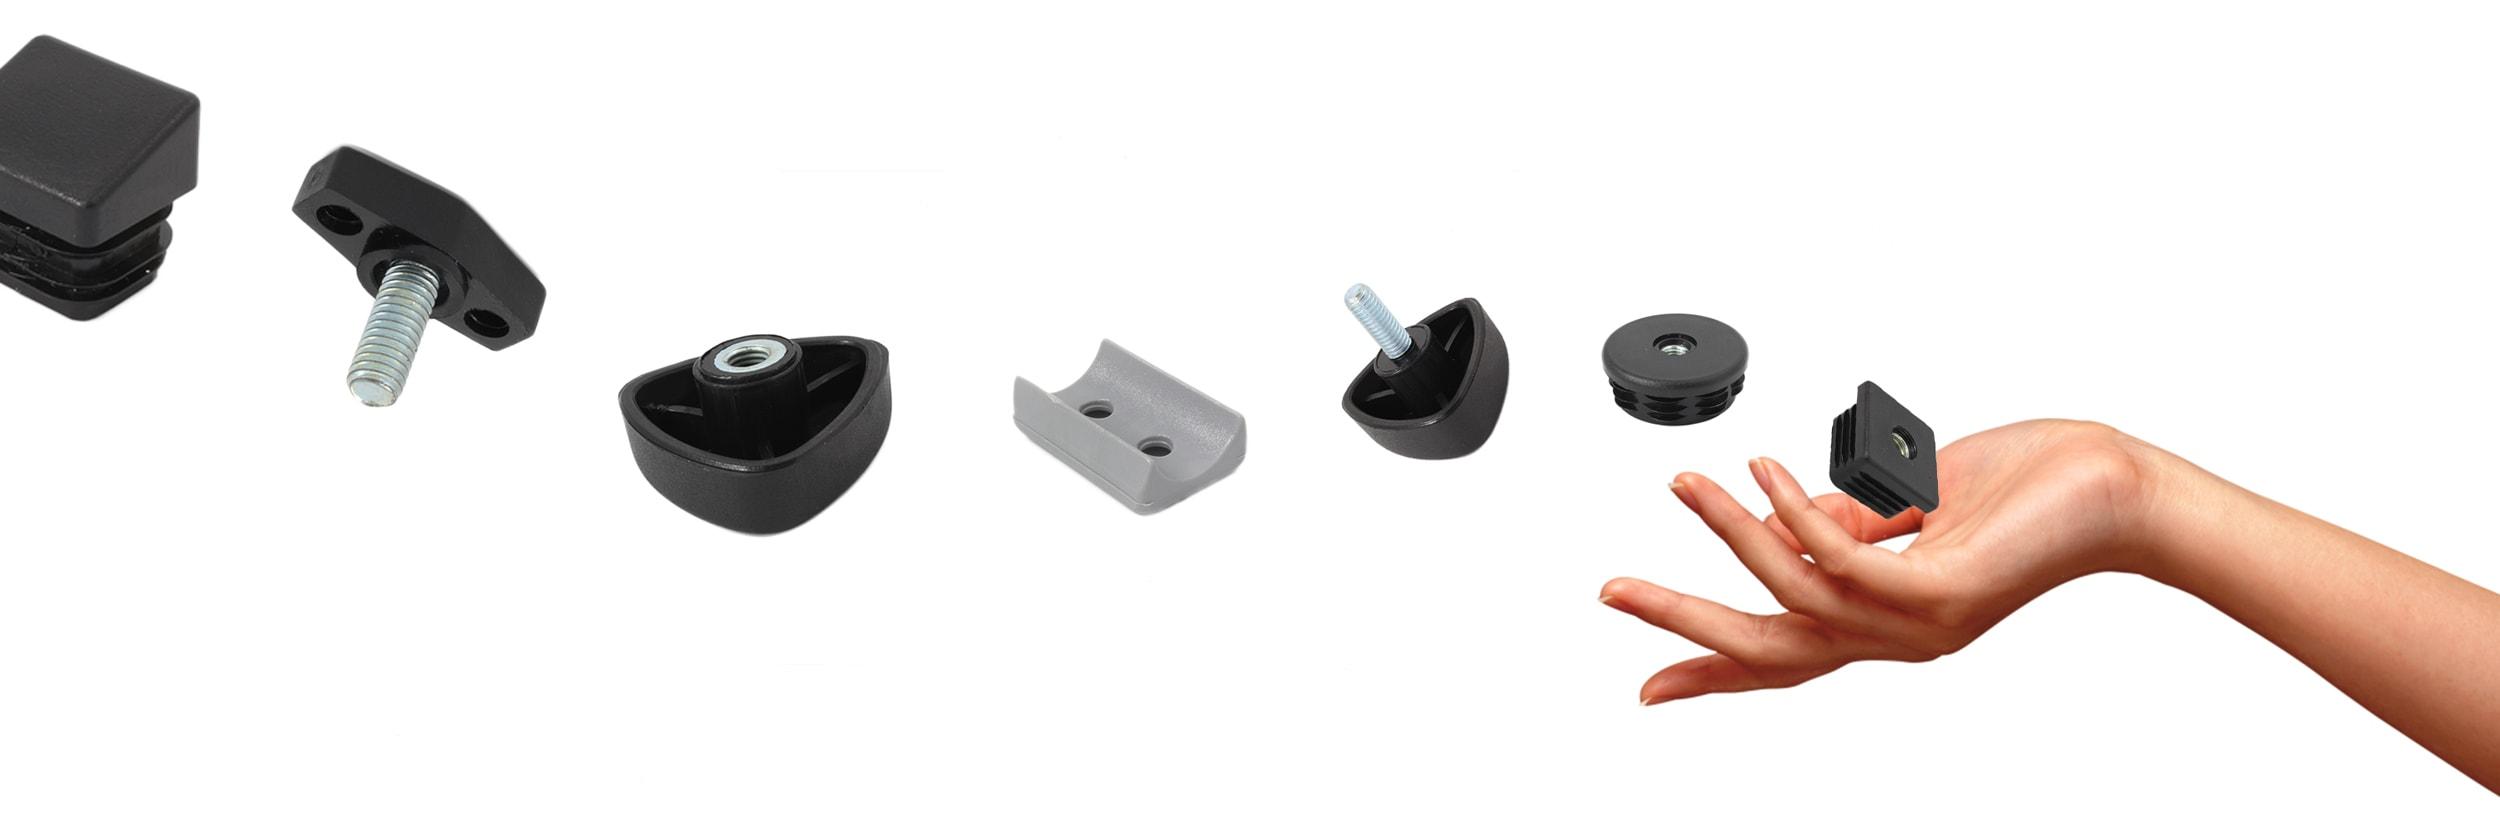 Plugs rectangular